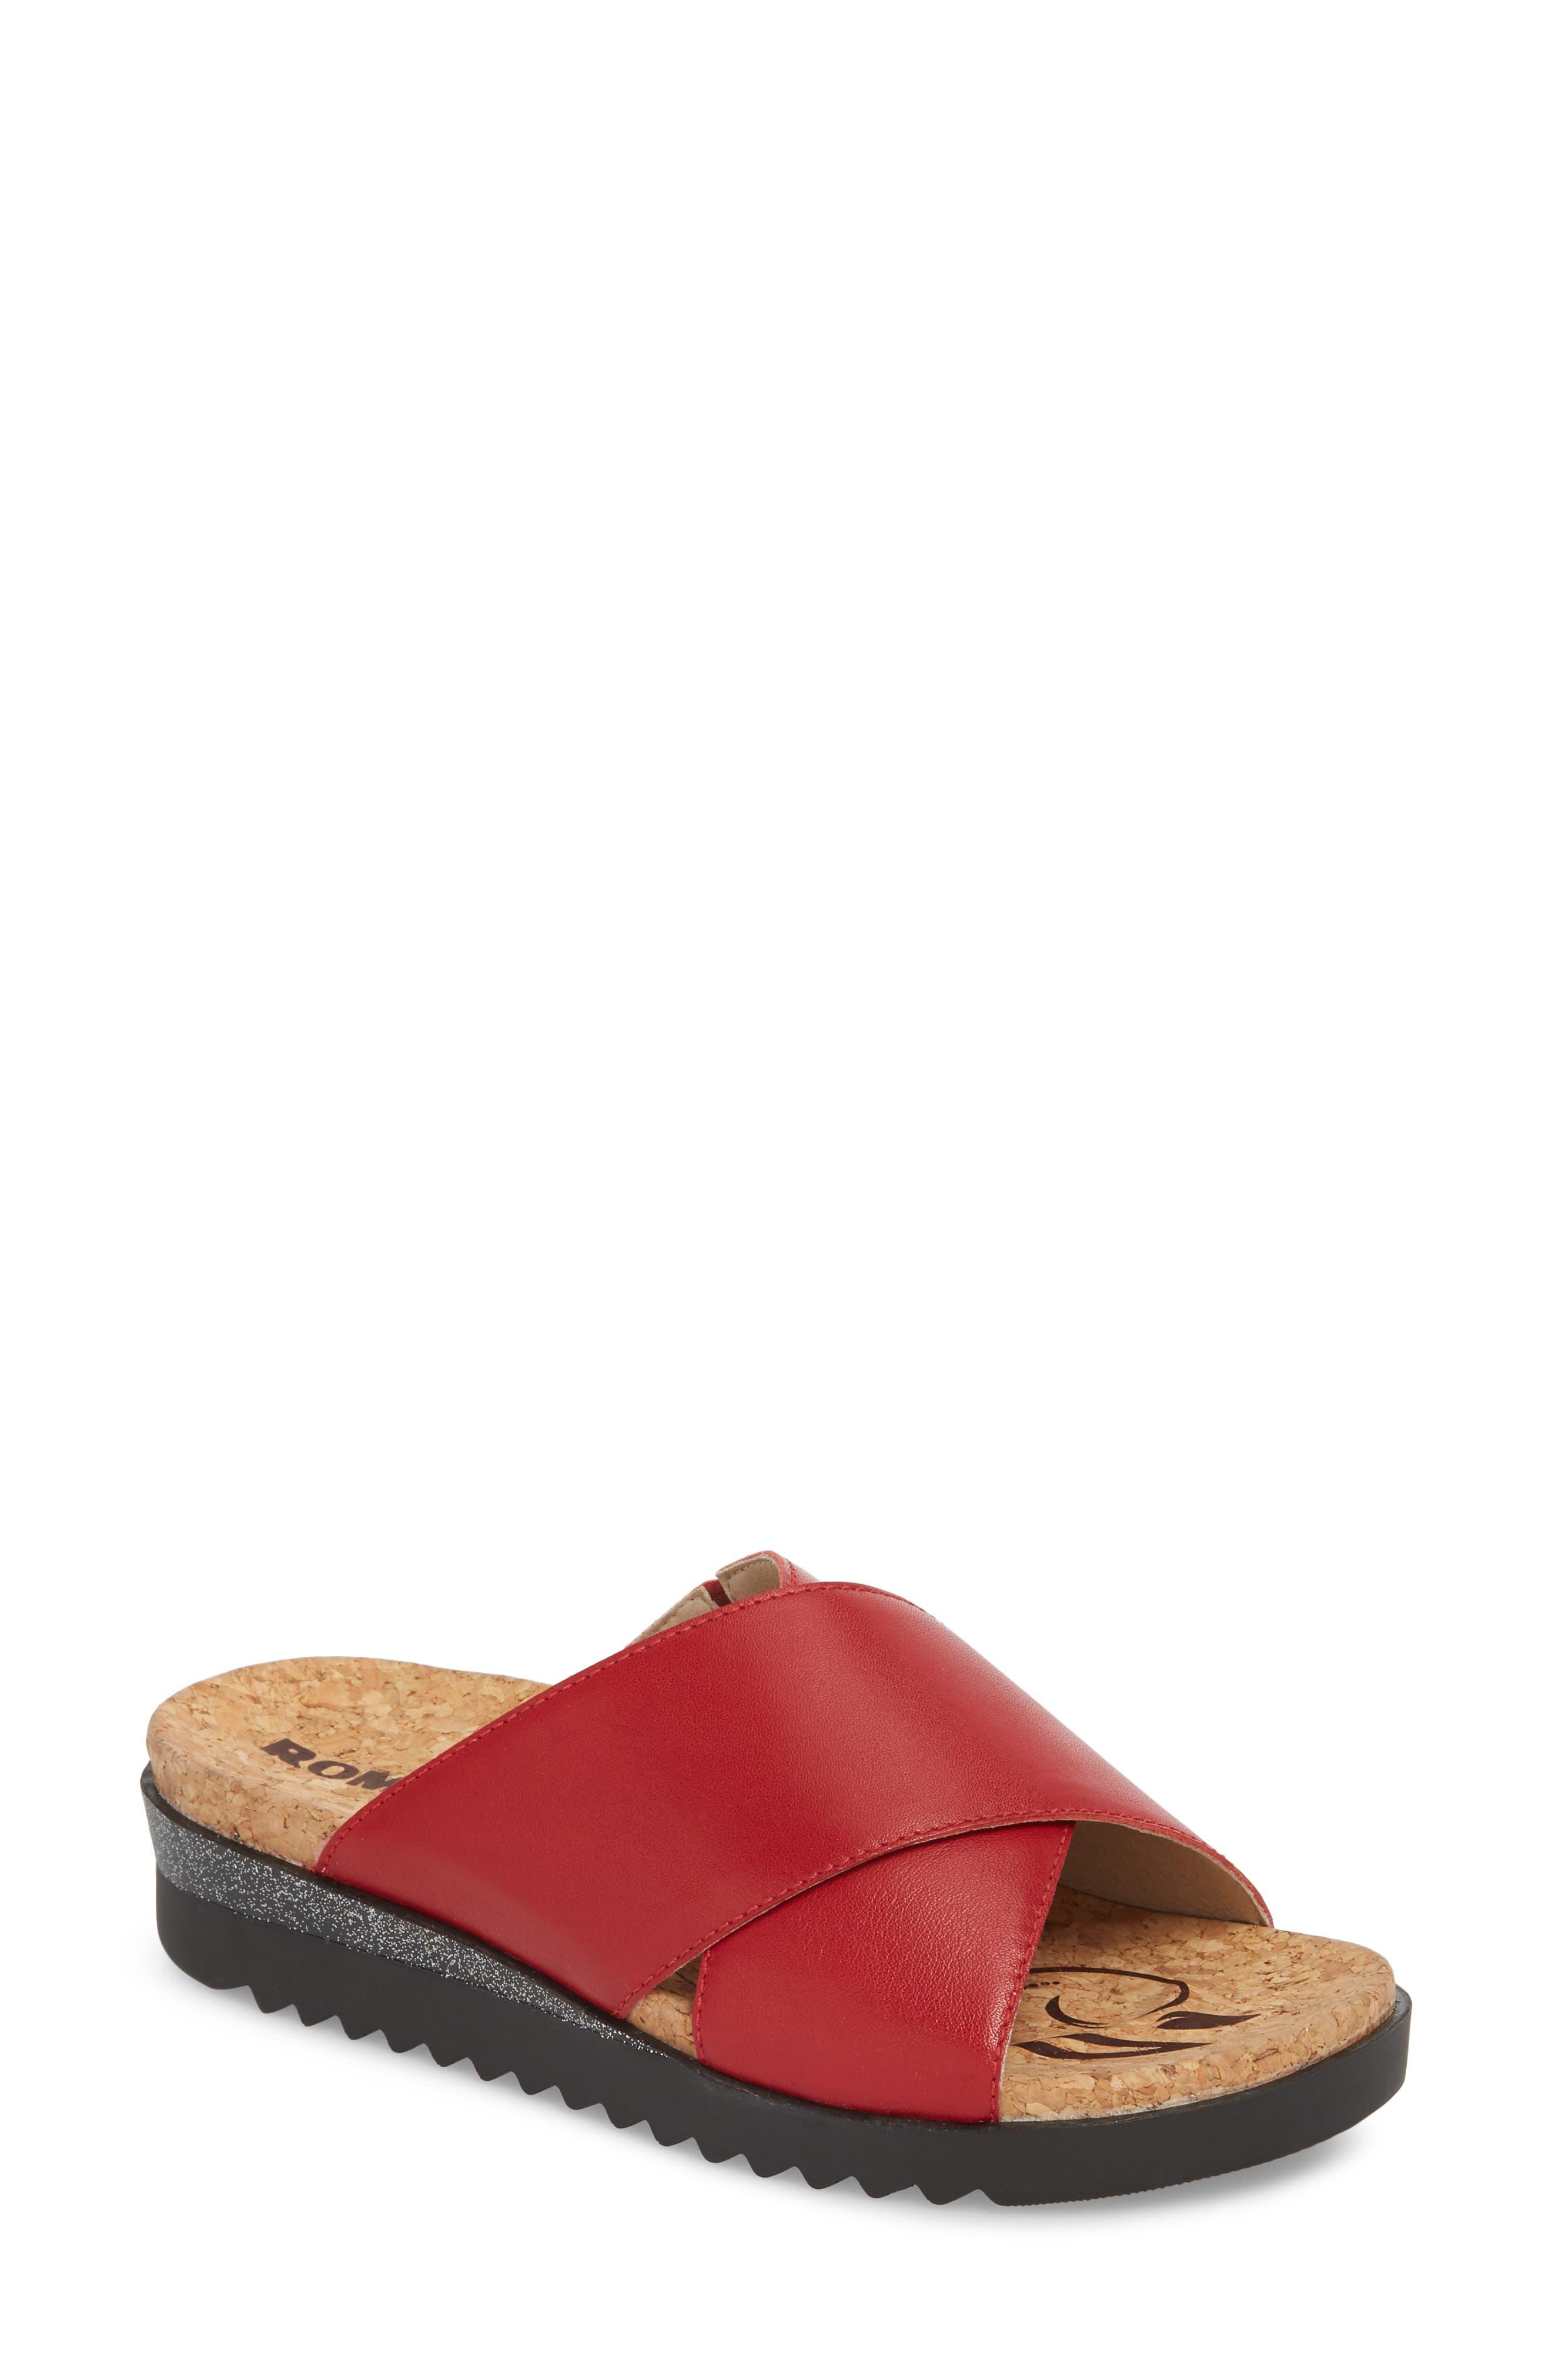 Hollywood 02 Slide Sandal,                         Main,                         color, Red Leather